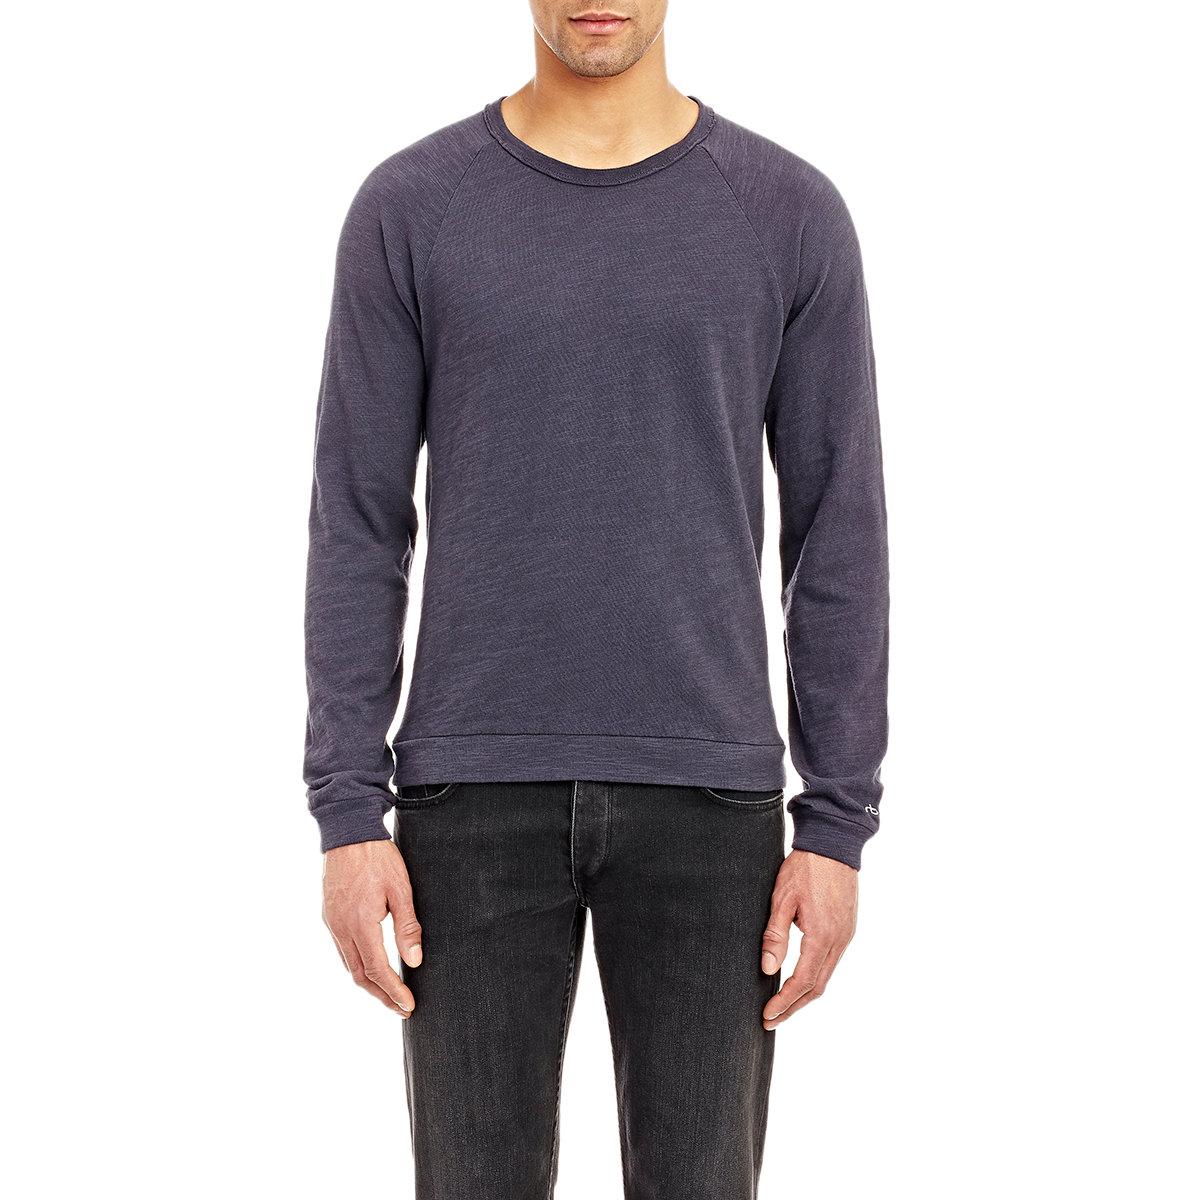 Rag bone men 39 s long sleeve raglan t shirt in blue for for Rag and bone mens shirts sale